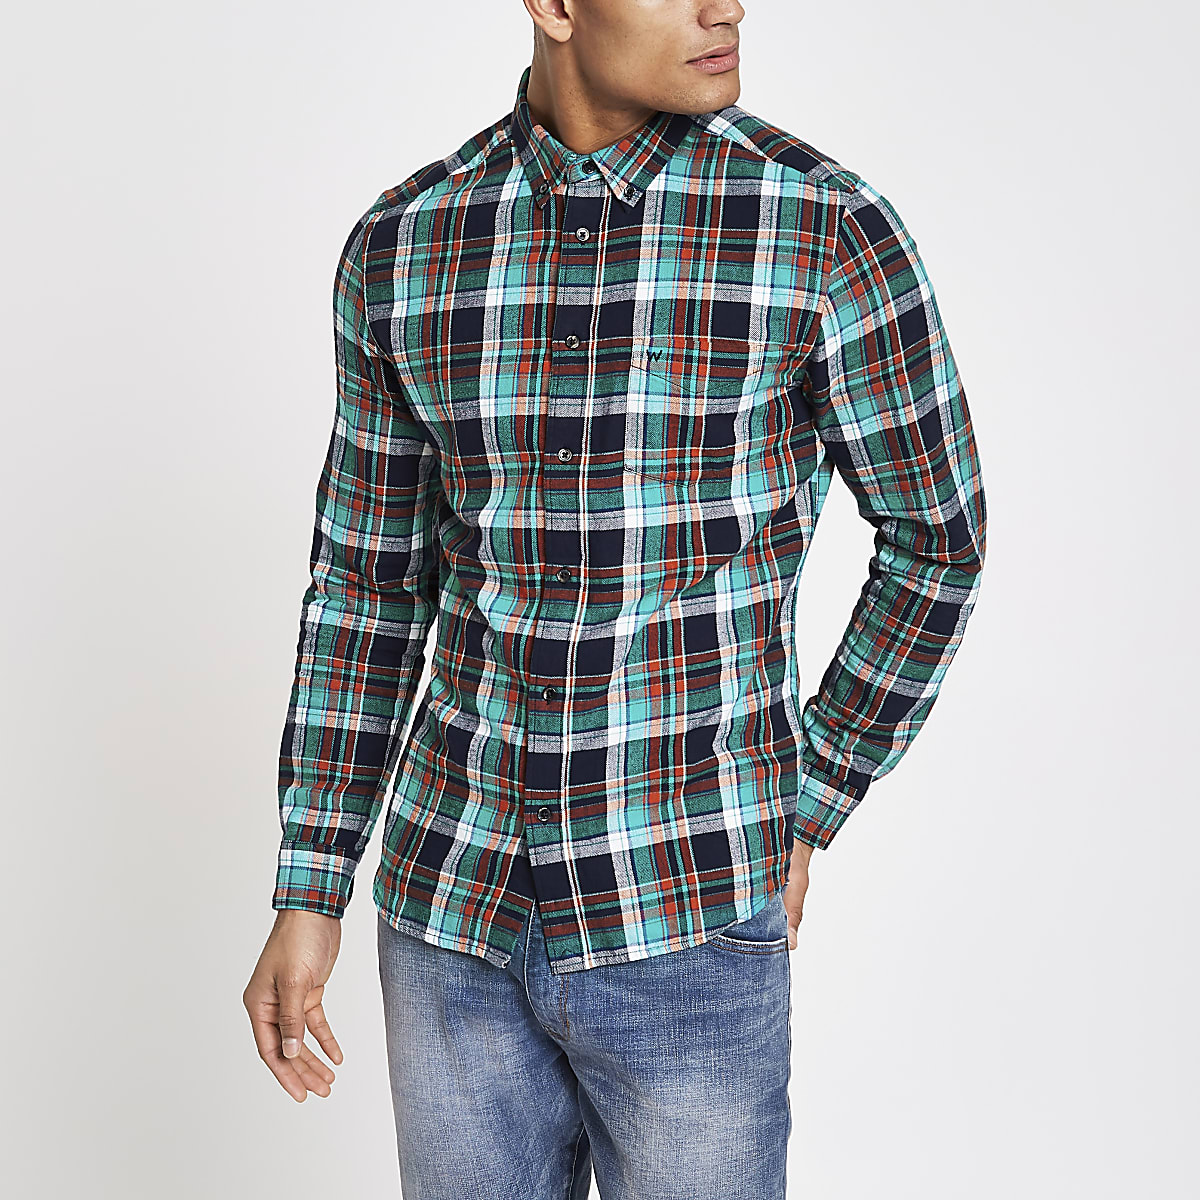 Wrangler blue long sleeve check shirt